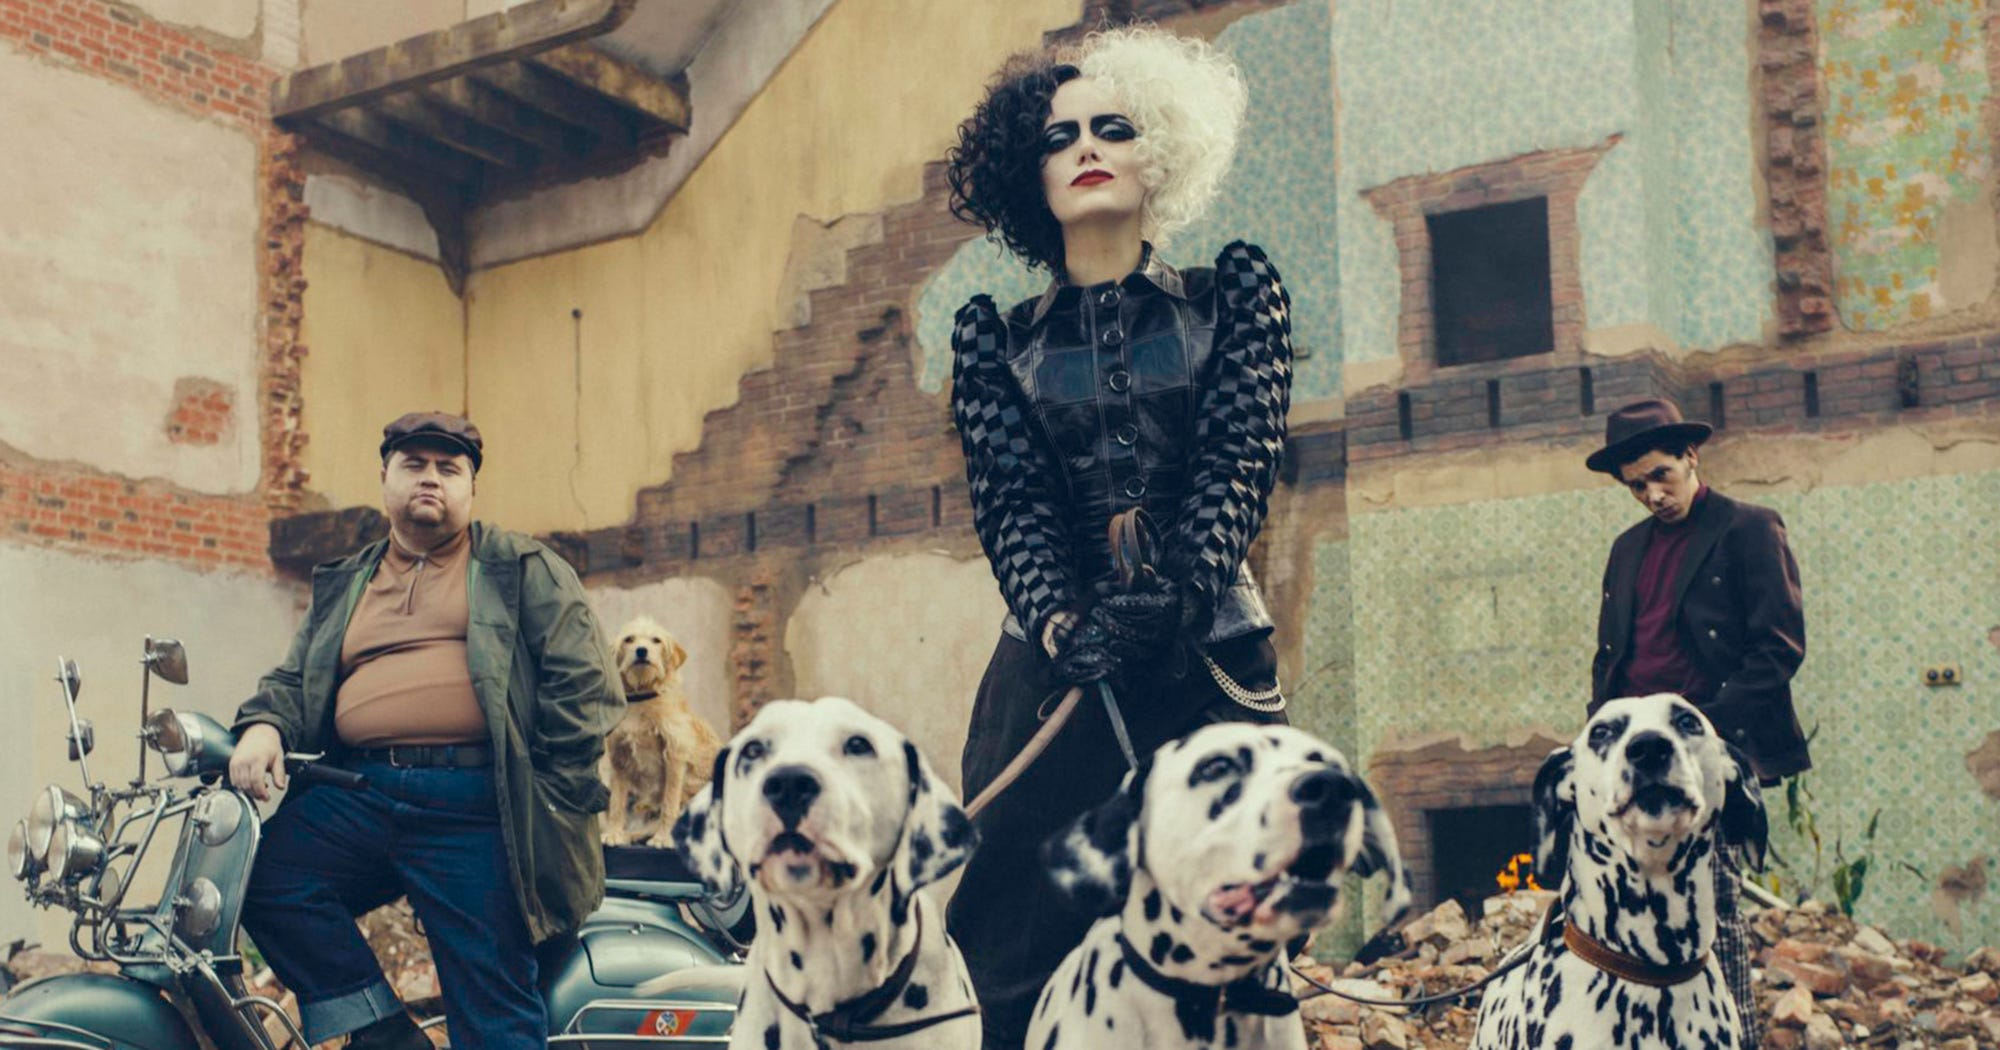 Emma Stone en Cruella d'Enfer version punk, ça donne ça